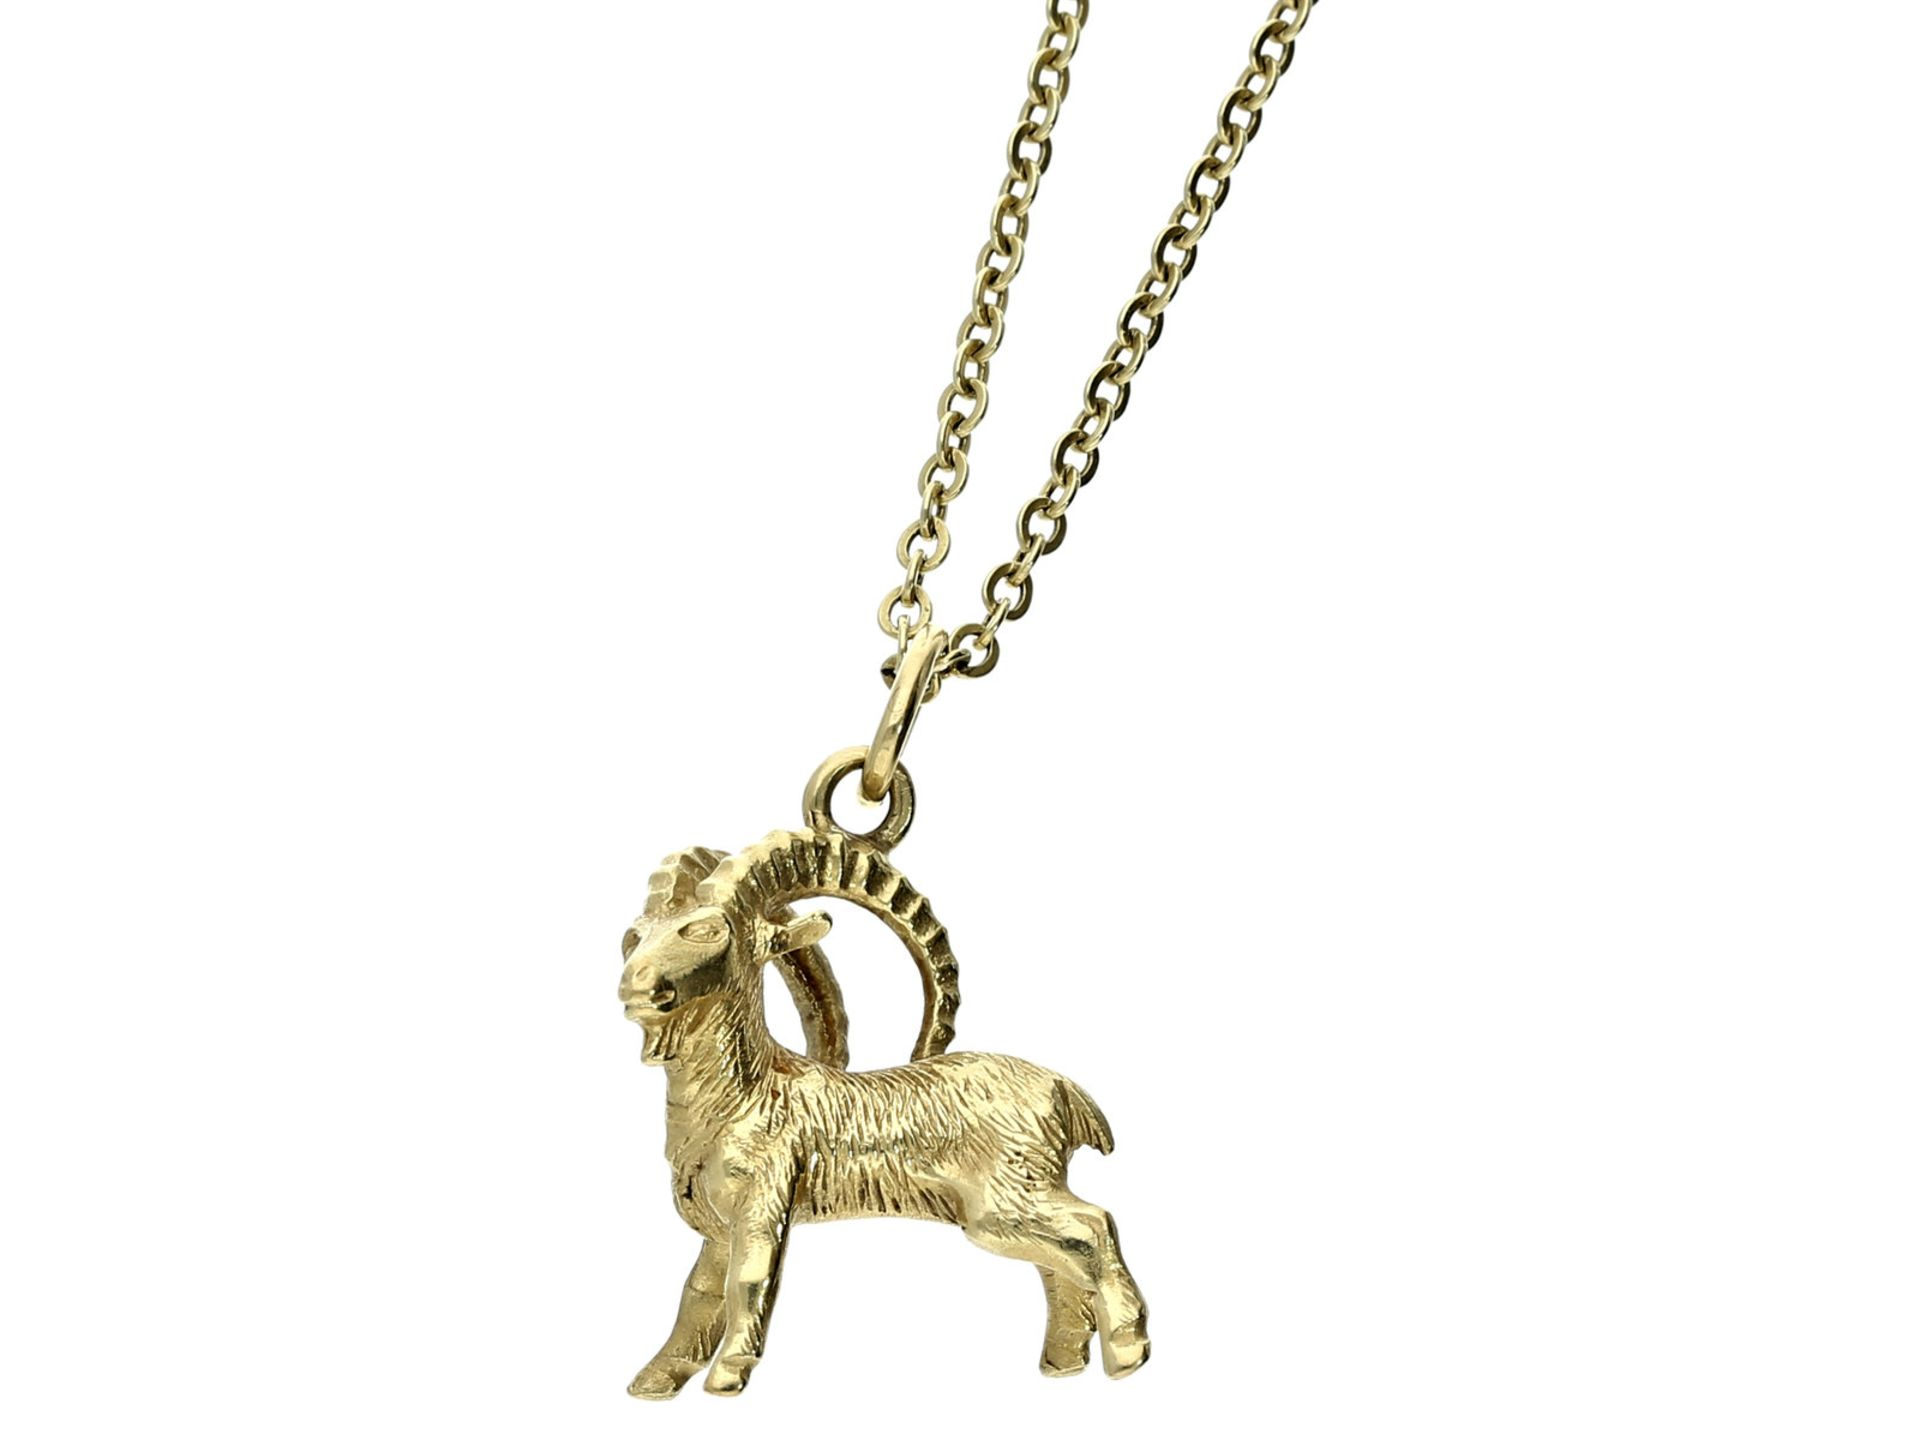 "Kette/Anhänger: feine Goldkette mit Anhänger ""Steinbock""Ca. 70cm lang, 14K Gold, Ankermuster,"